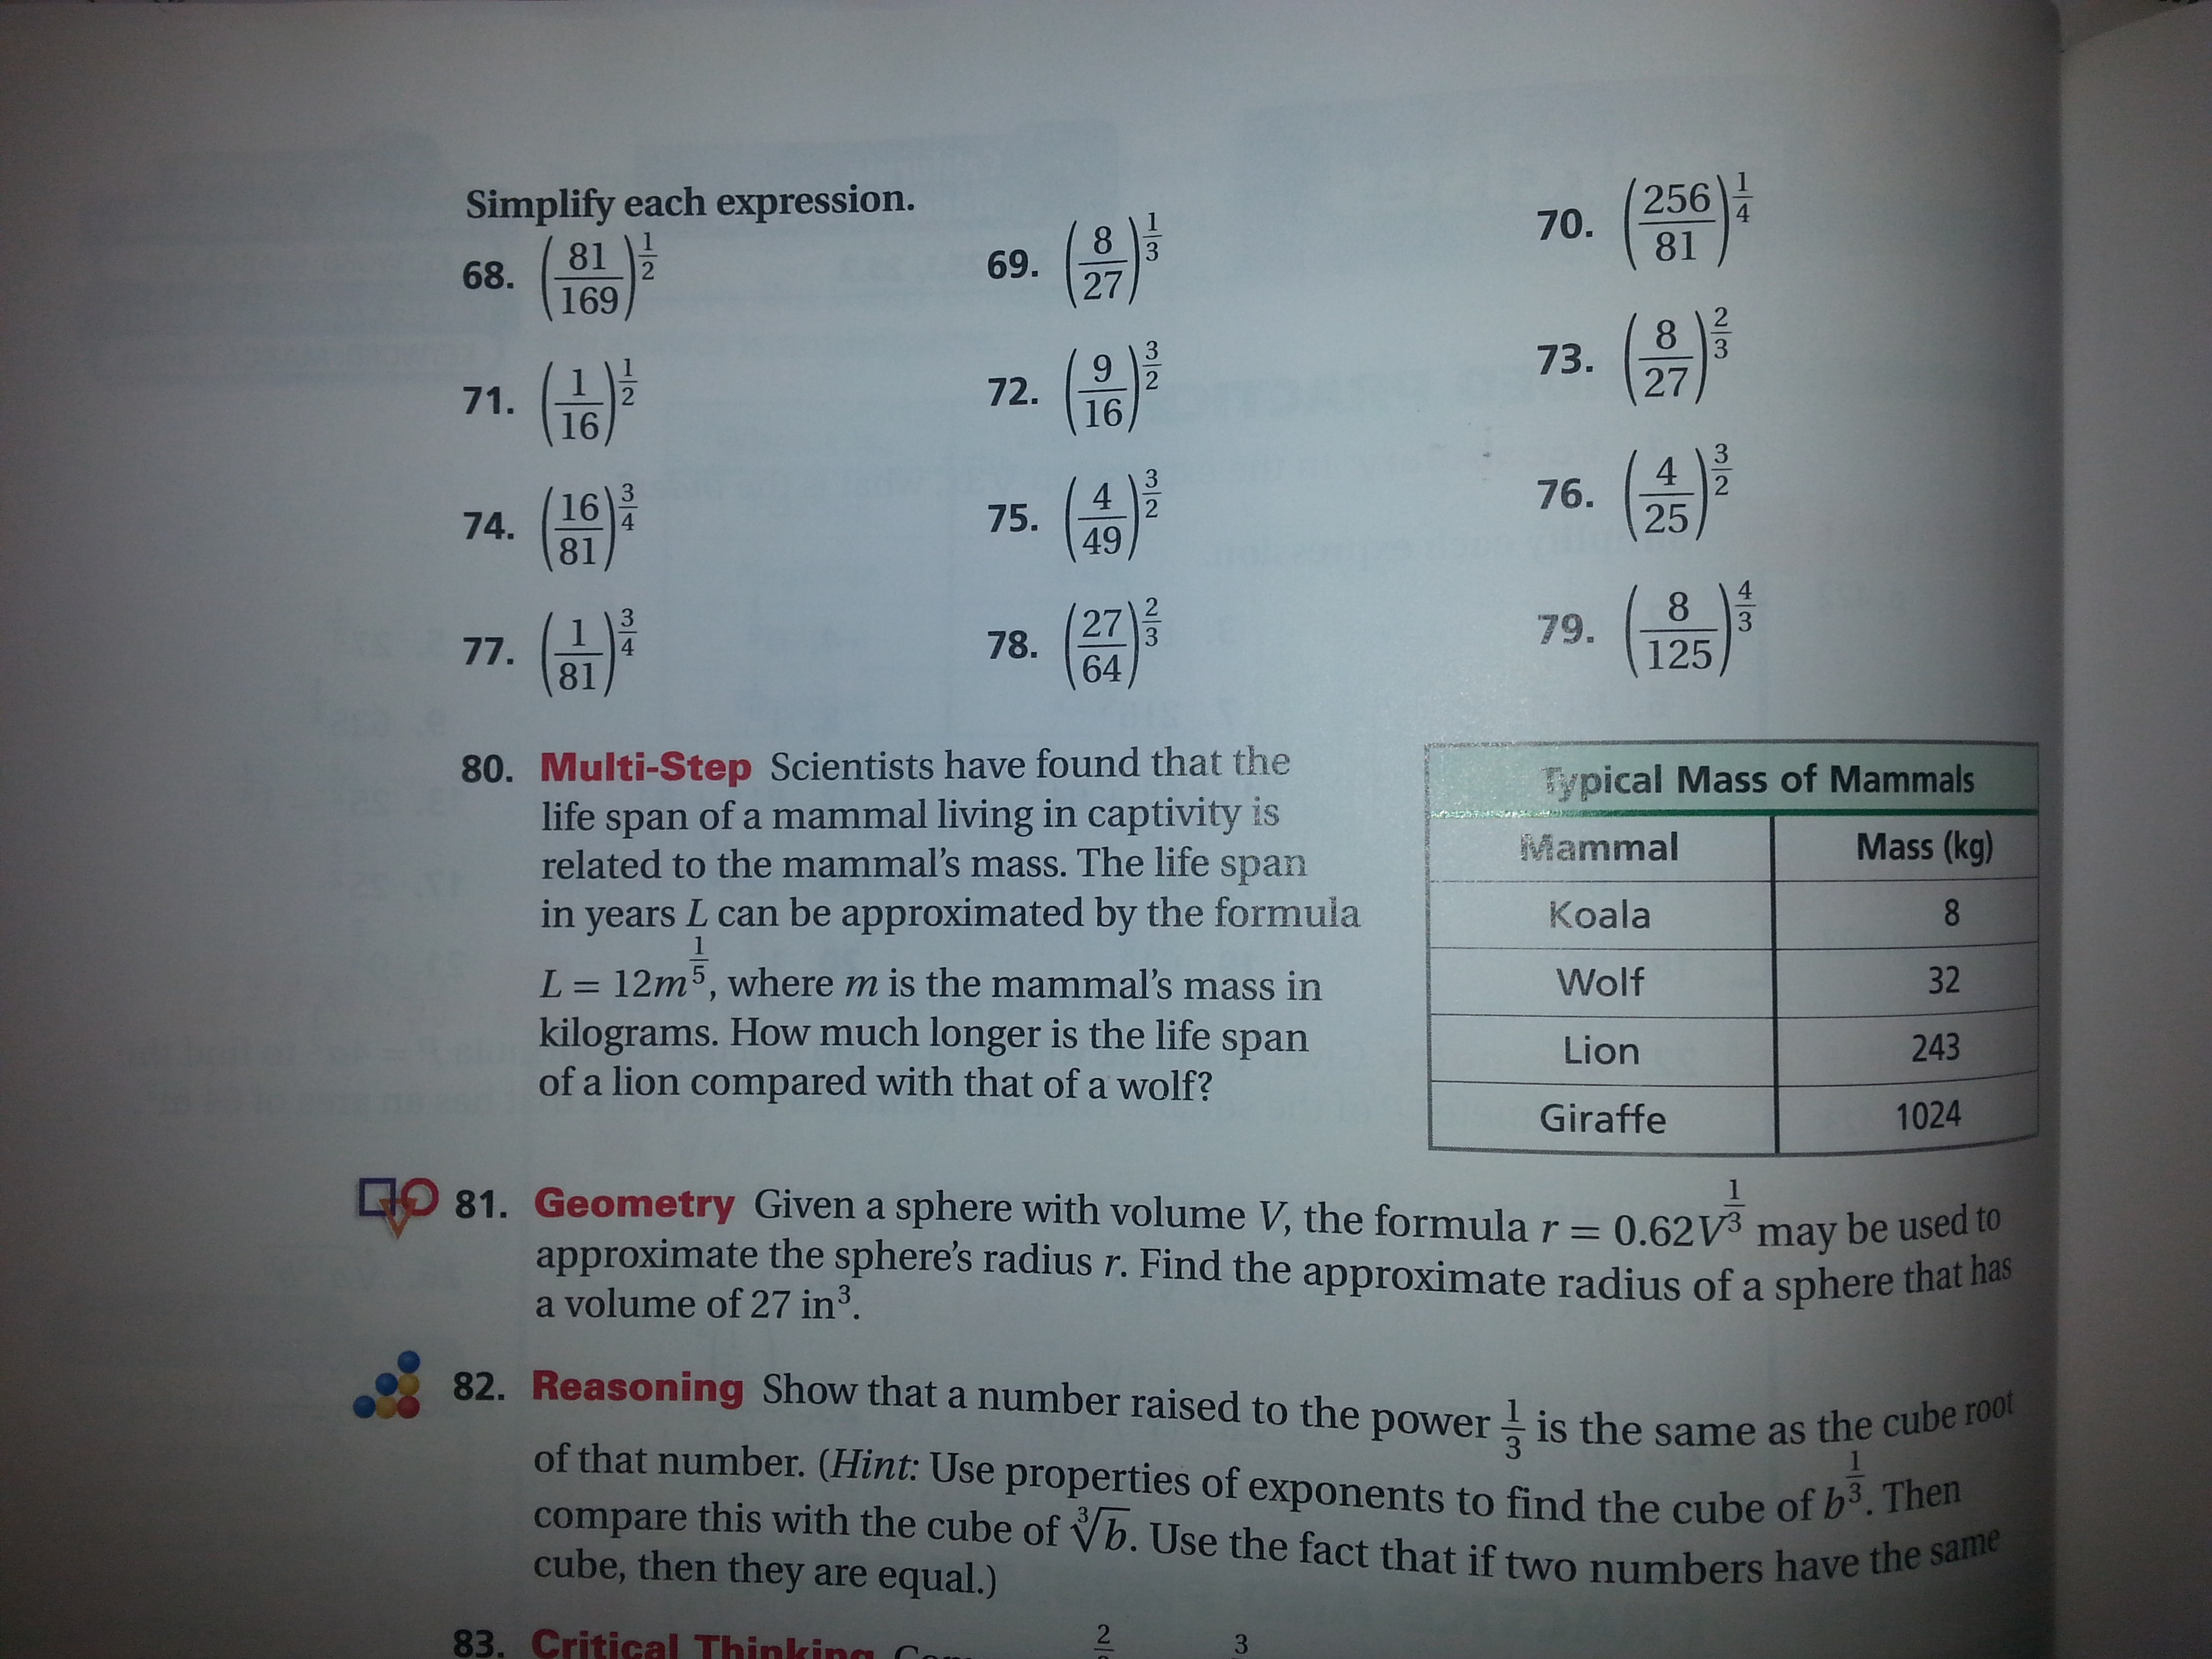 Gebhard, Curt / Alg Unit 7 - Exponents and Polynomials